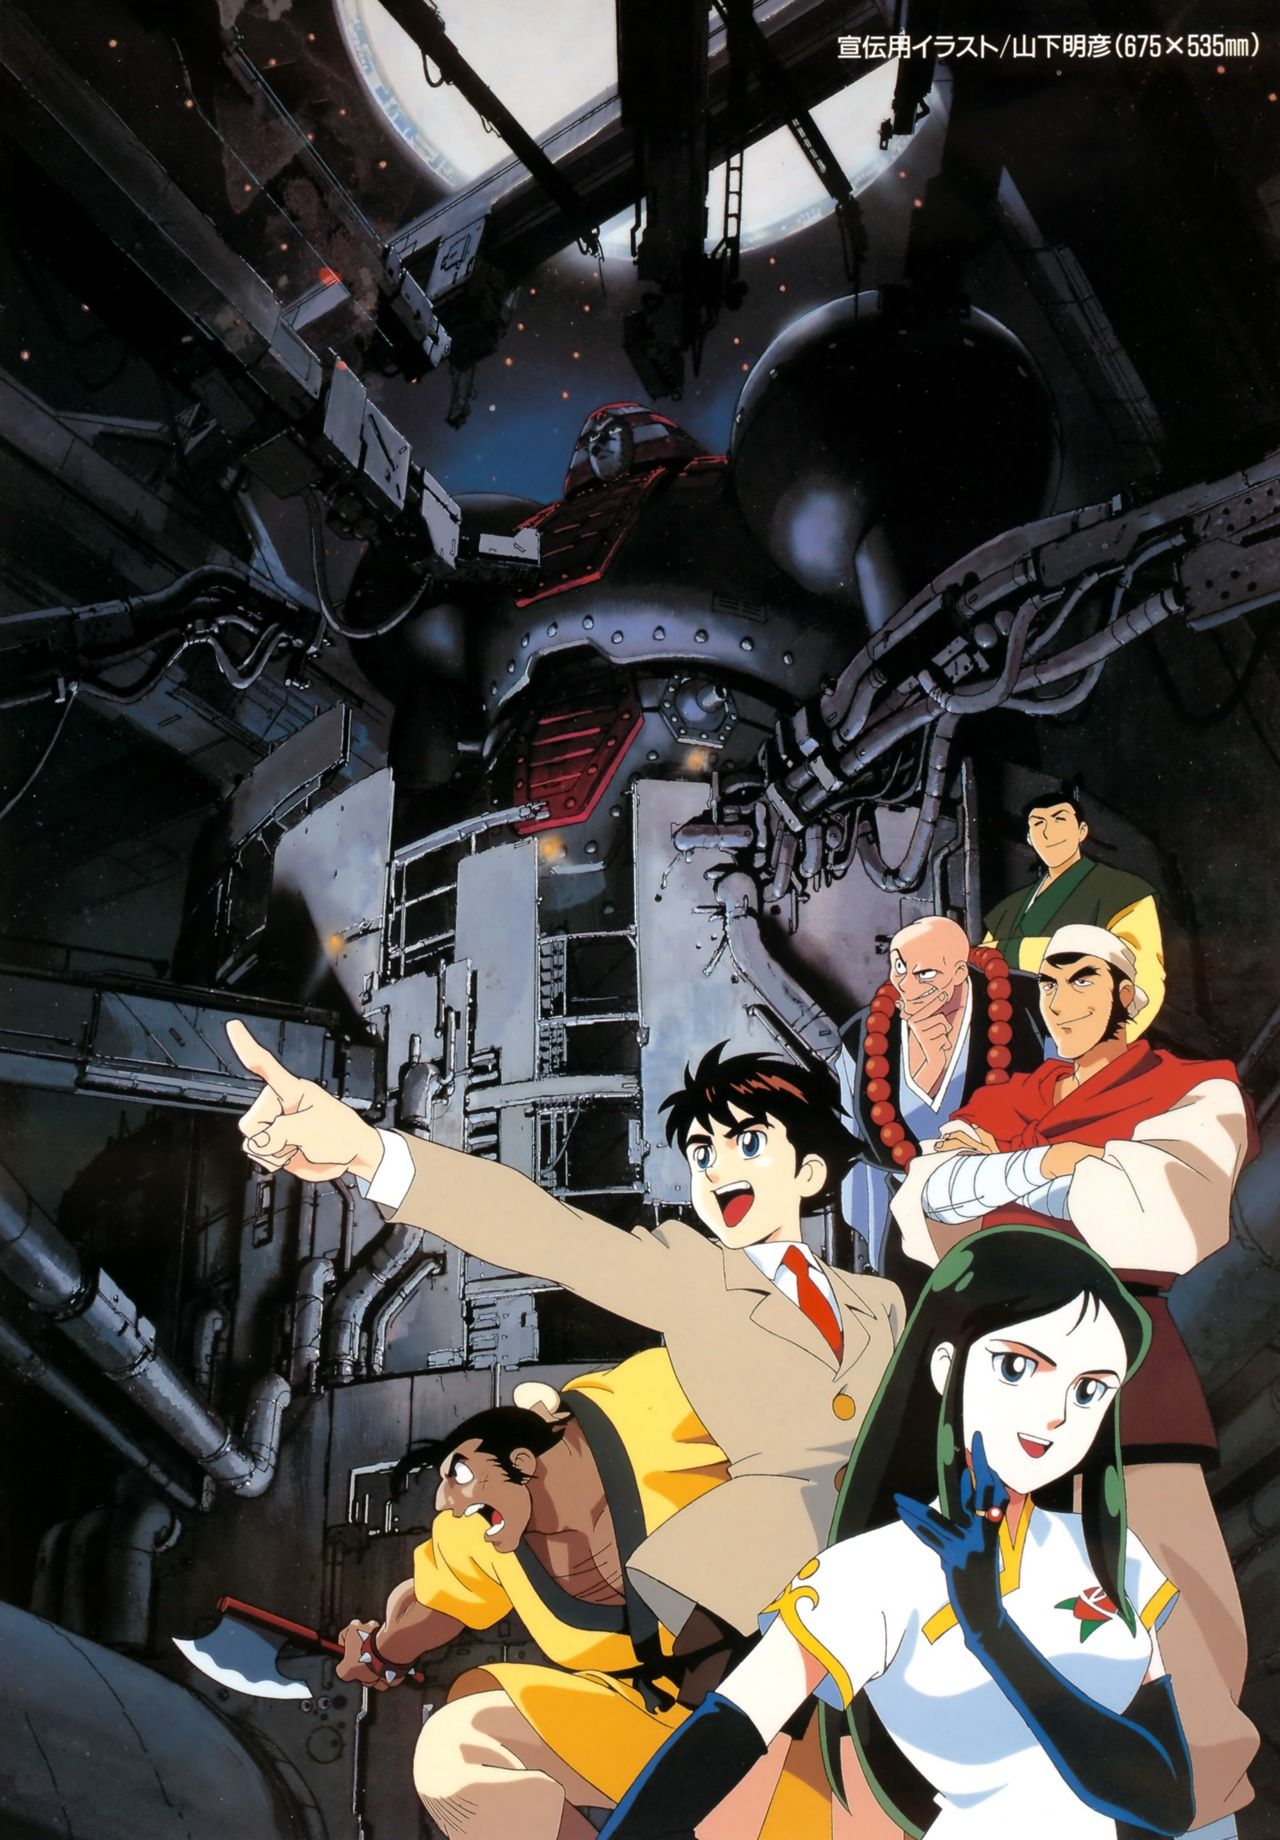 Giant Robo by Akihiko Yamashita Popular anime, Robot art